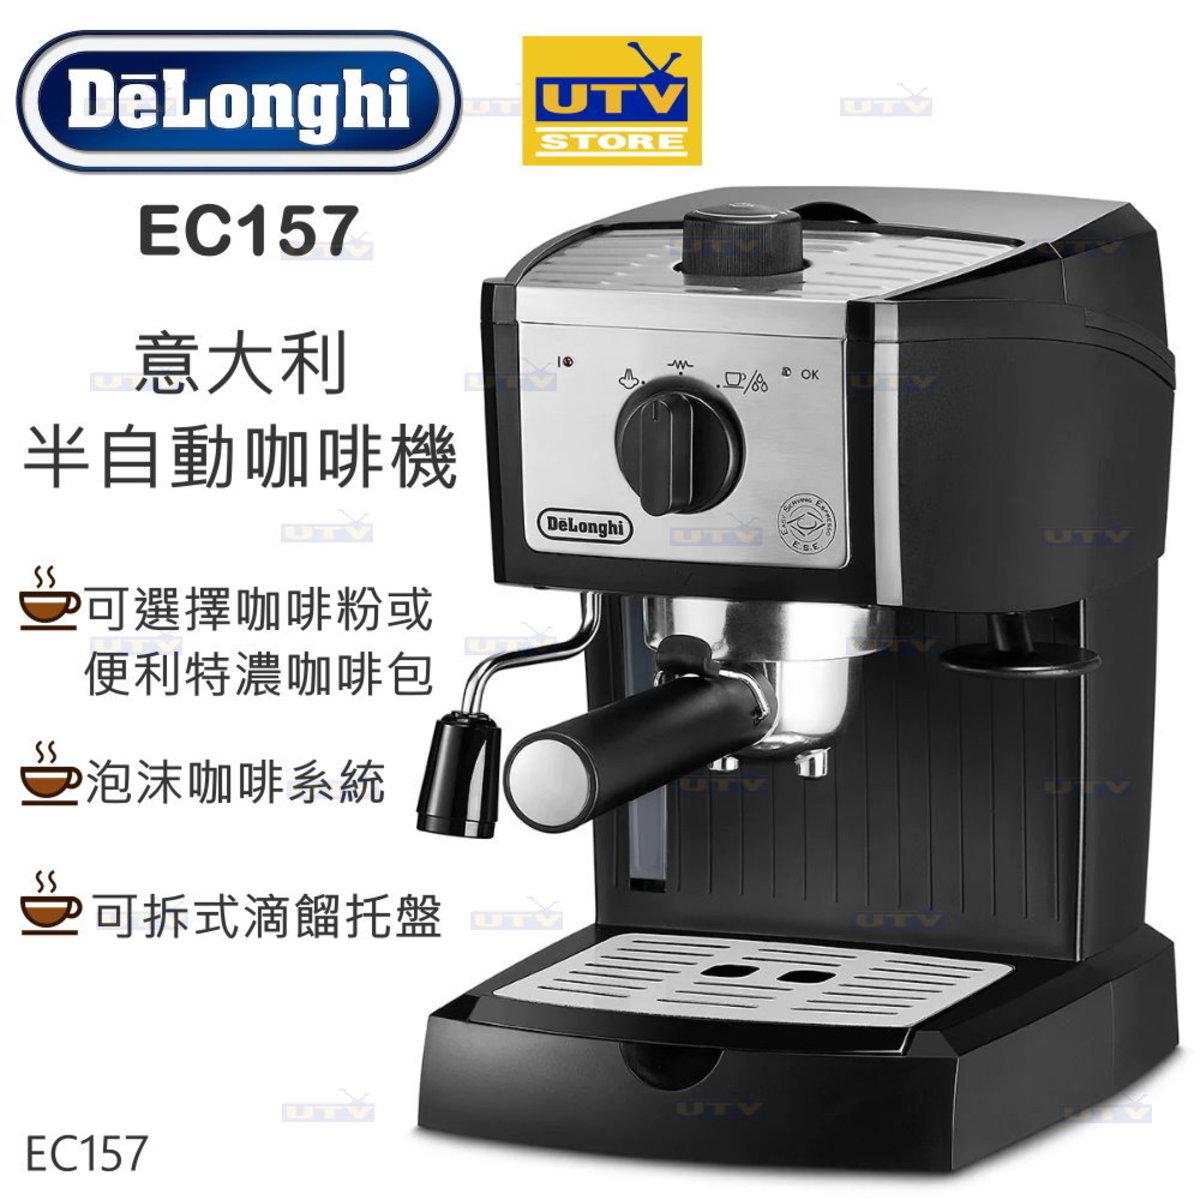 EC157 意大利 半自動咖啡機